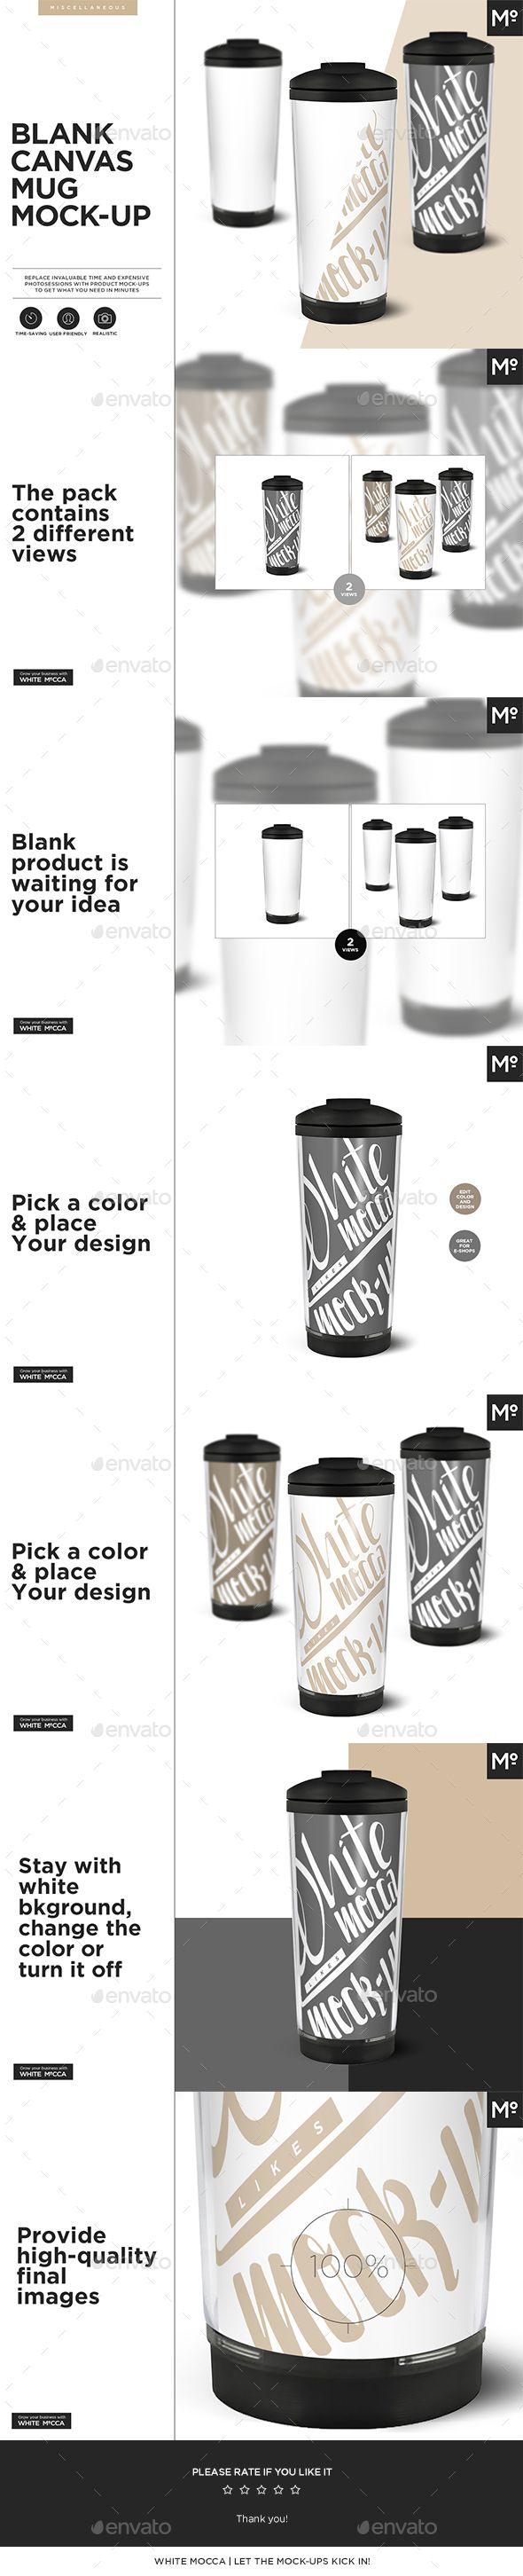 Blank Canvas Mug #Mock-up - Food and Drink Packaging